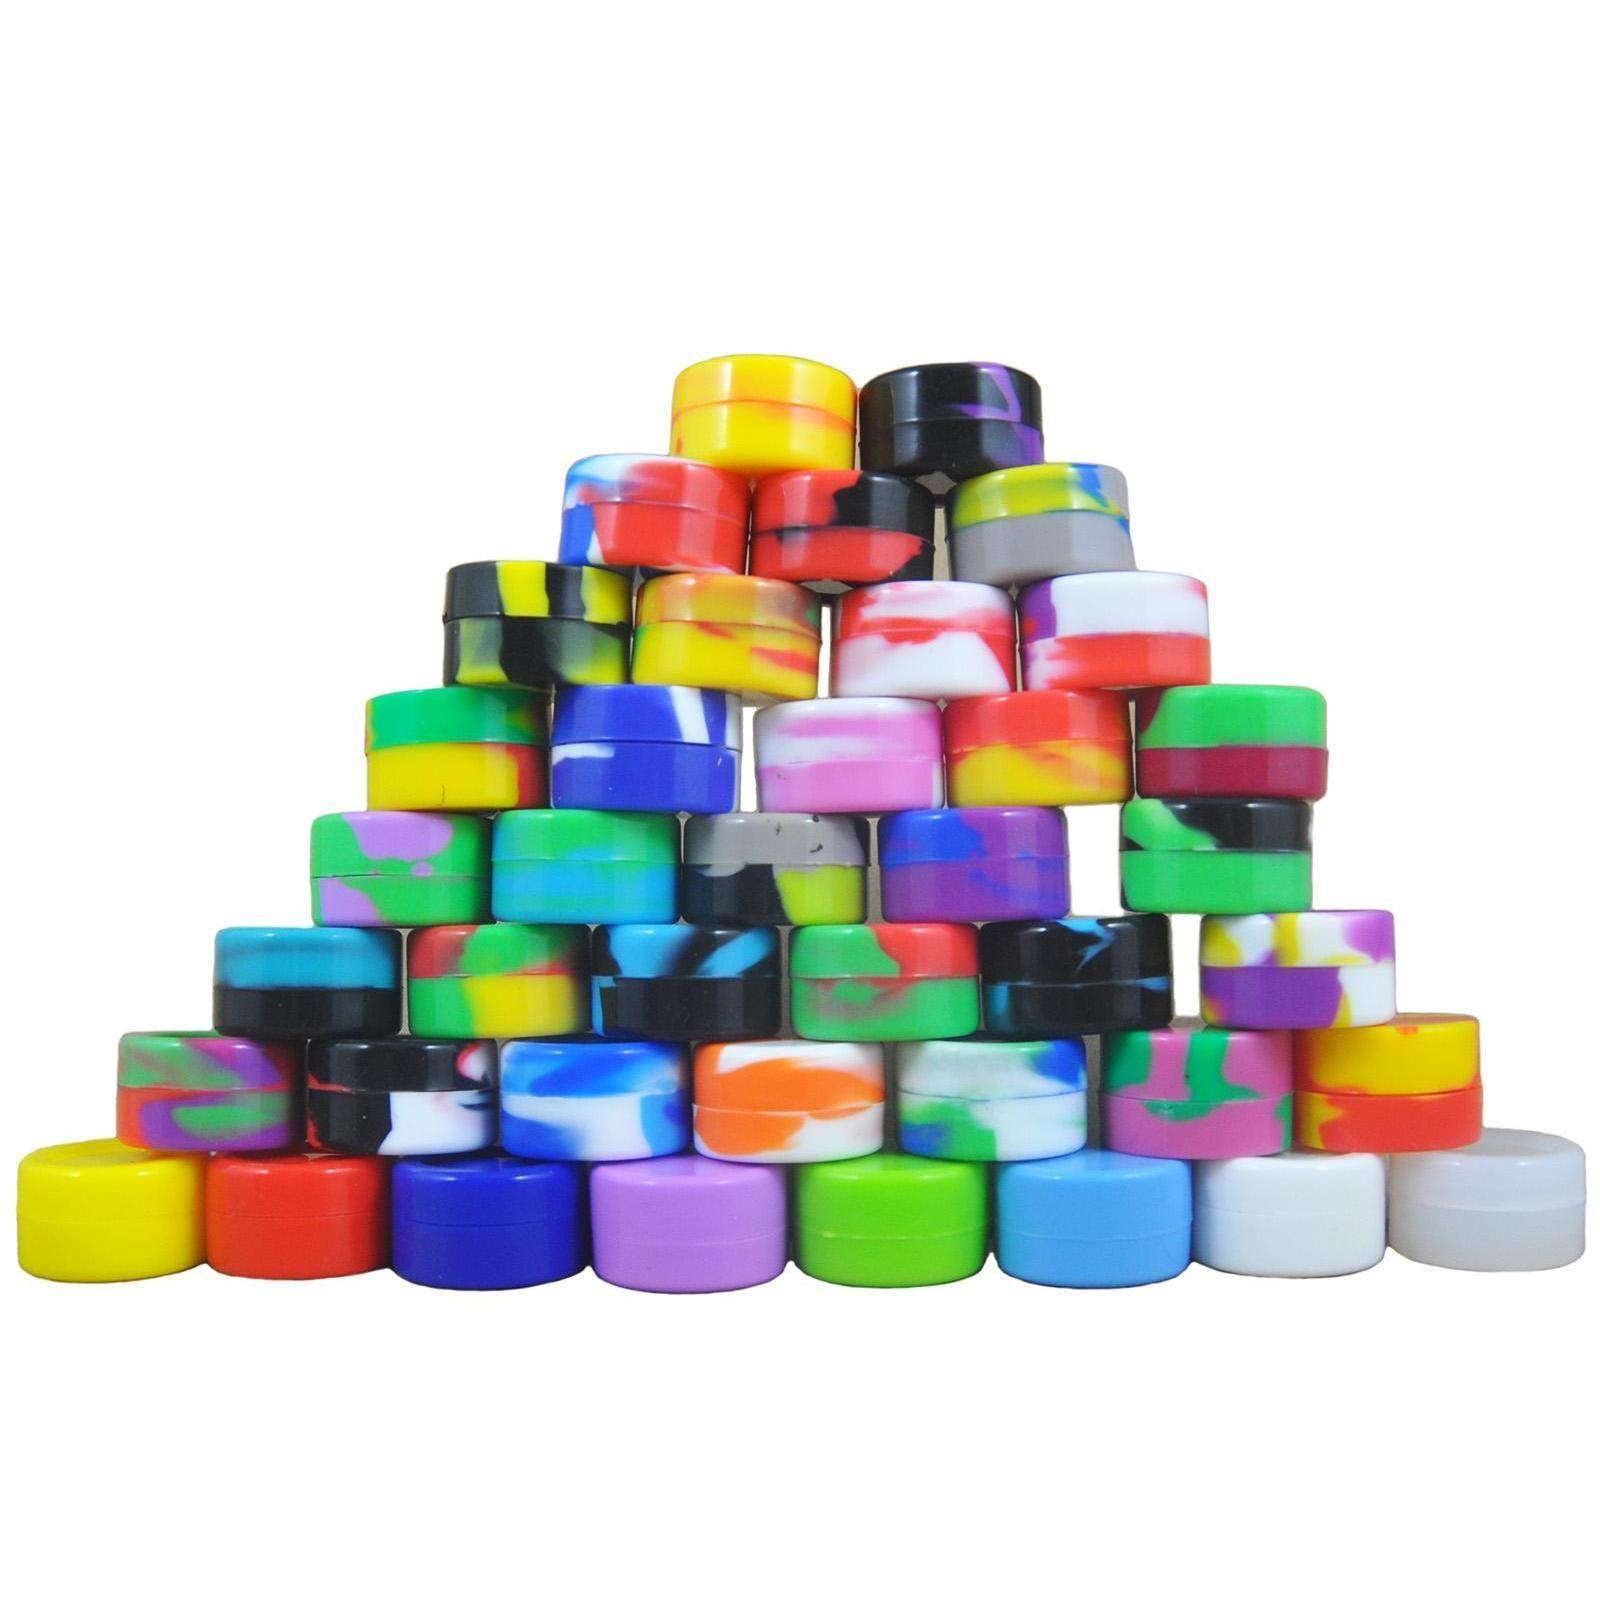 /ups 5 ml non-stick silicone jar dab wax 5 ml containers non-solid colors silicone jars concentrate case dabs silicone storage